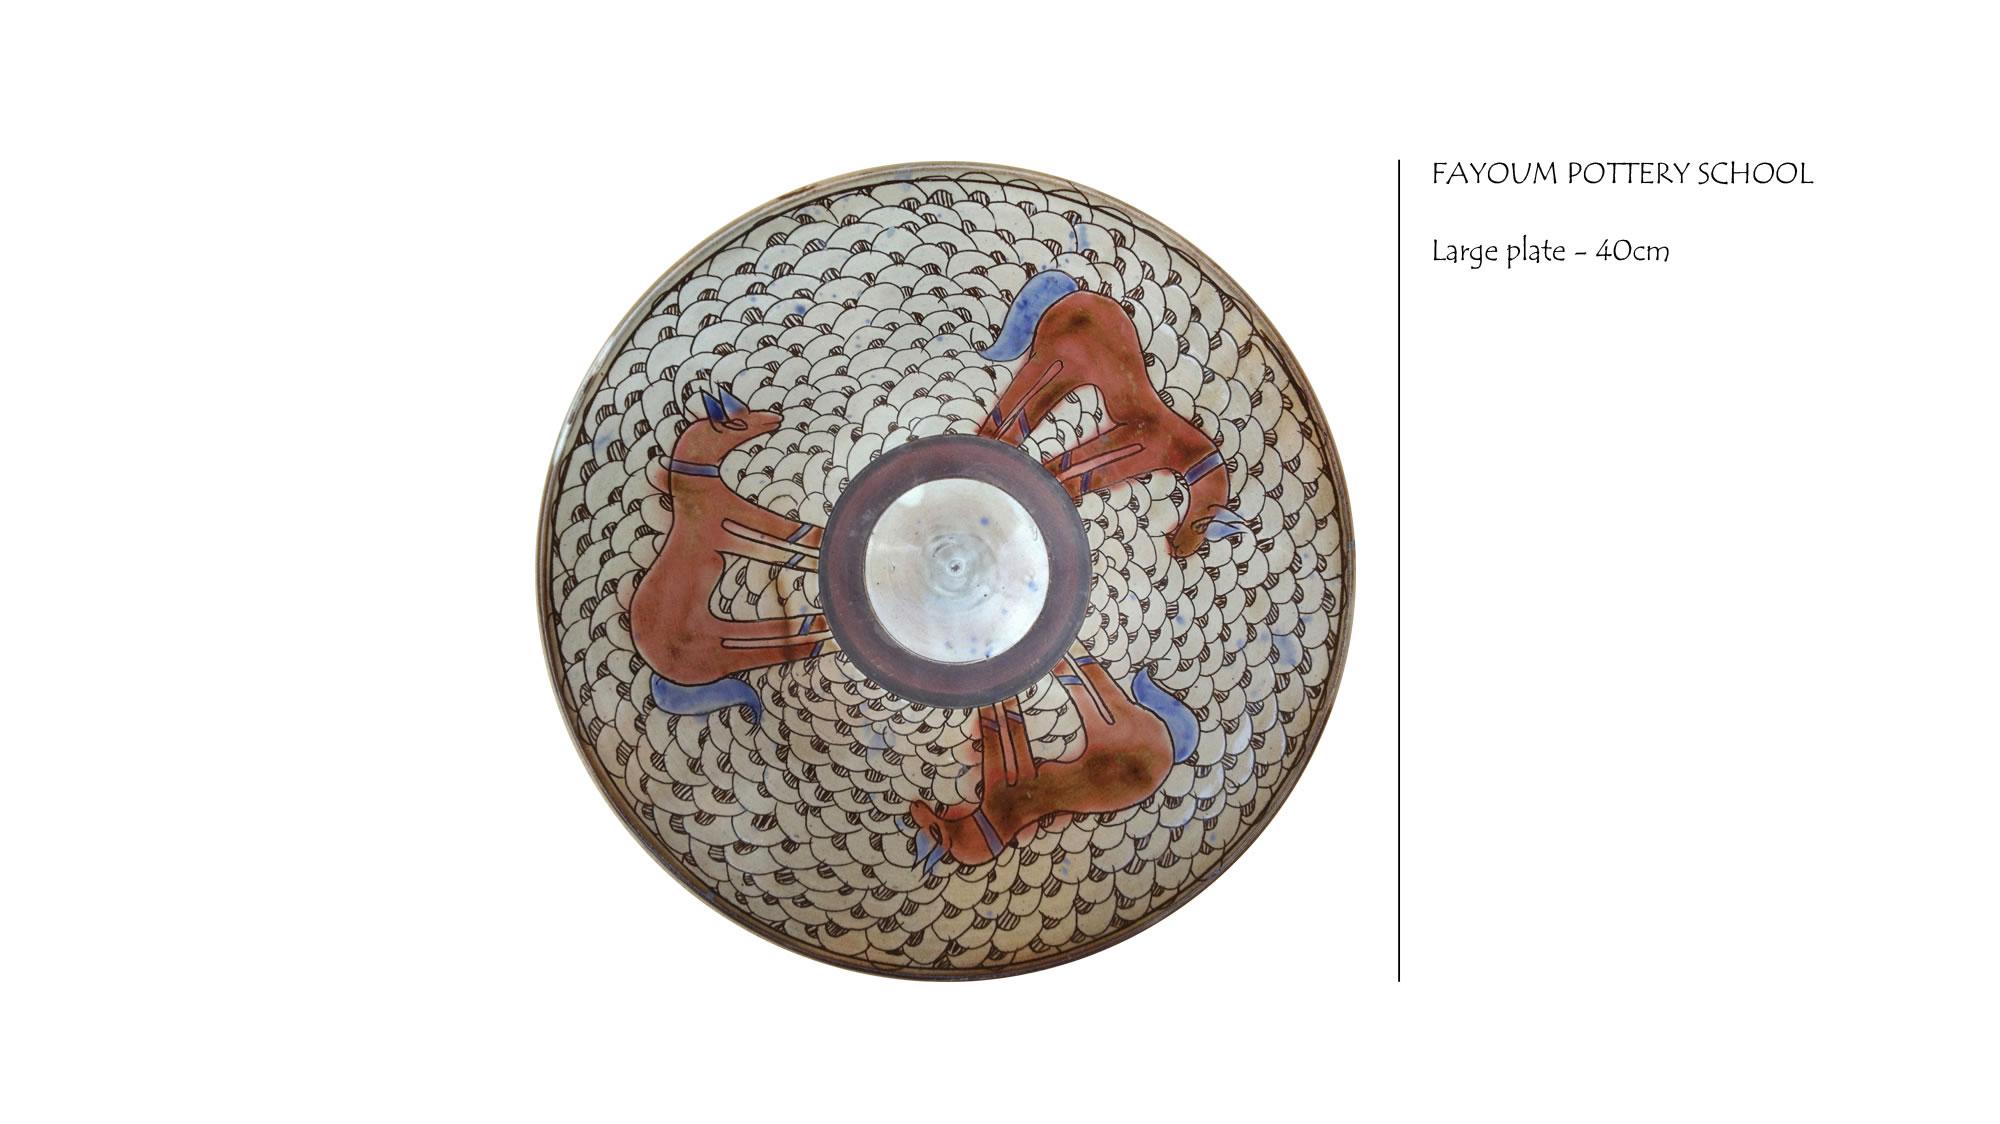 fayoum-pottery-school-11.jpg